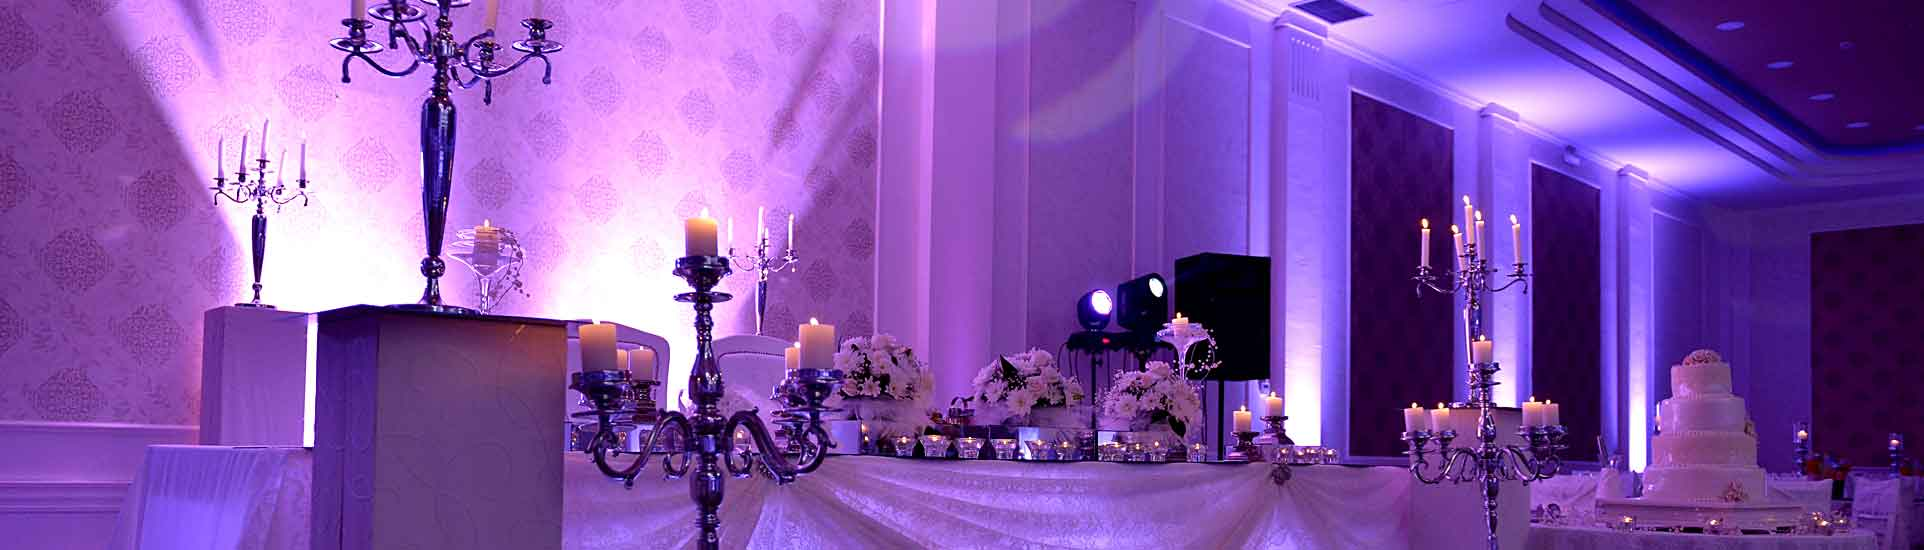 rhodes-weddings-uplights-header